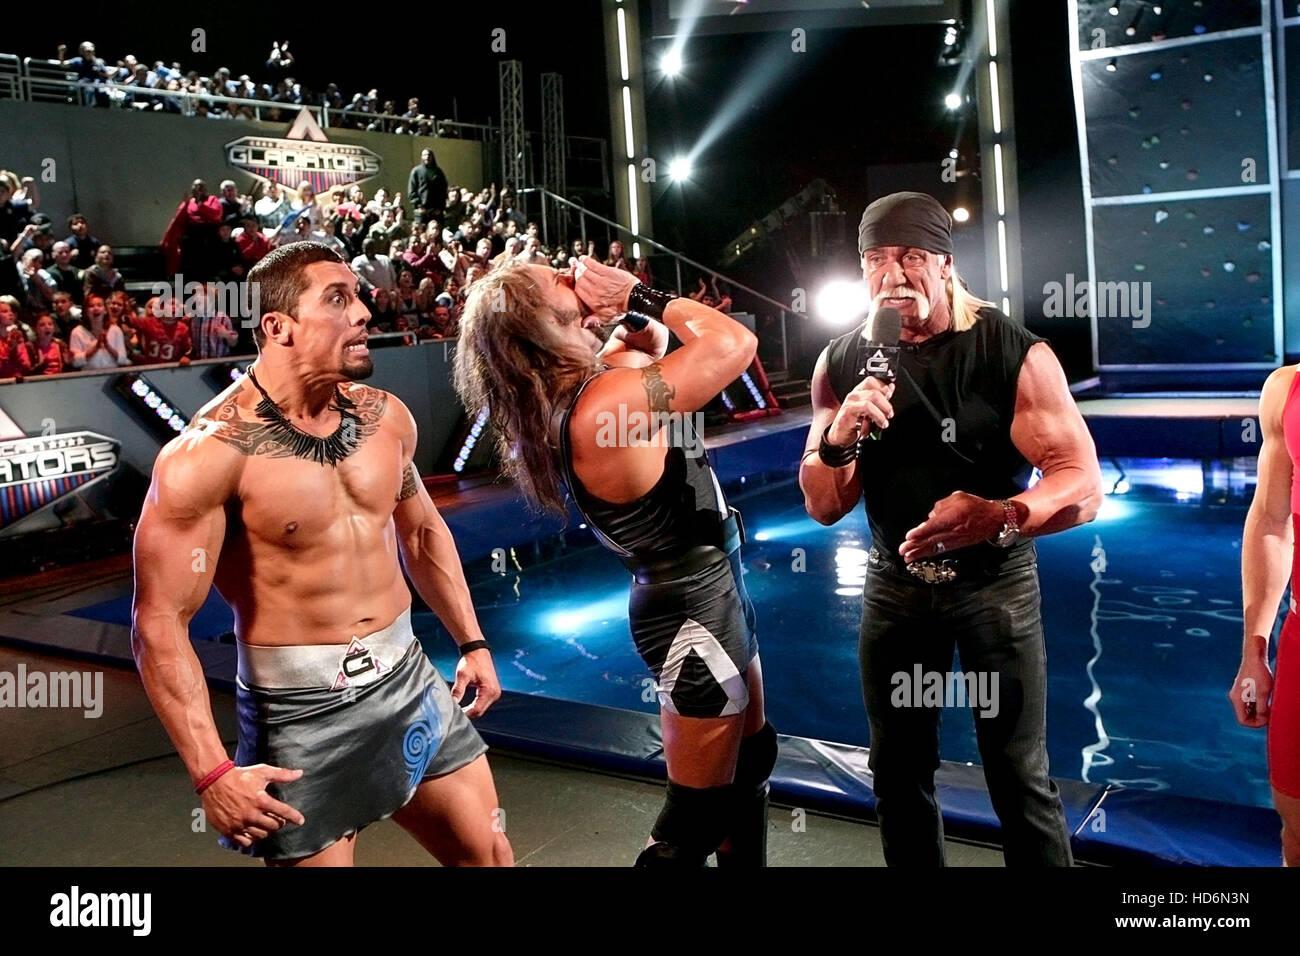 Hulk hogan presents american gladiators like its naked (99 photo), Tits Celebrites picture